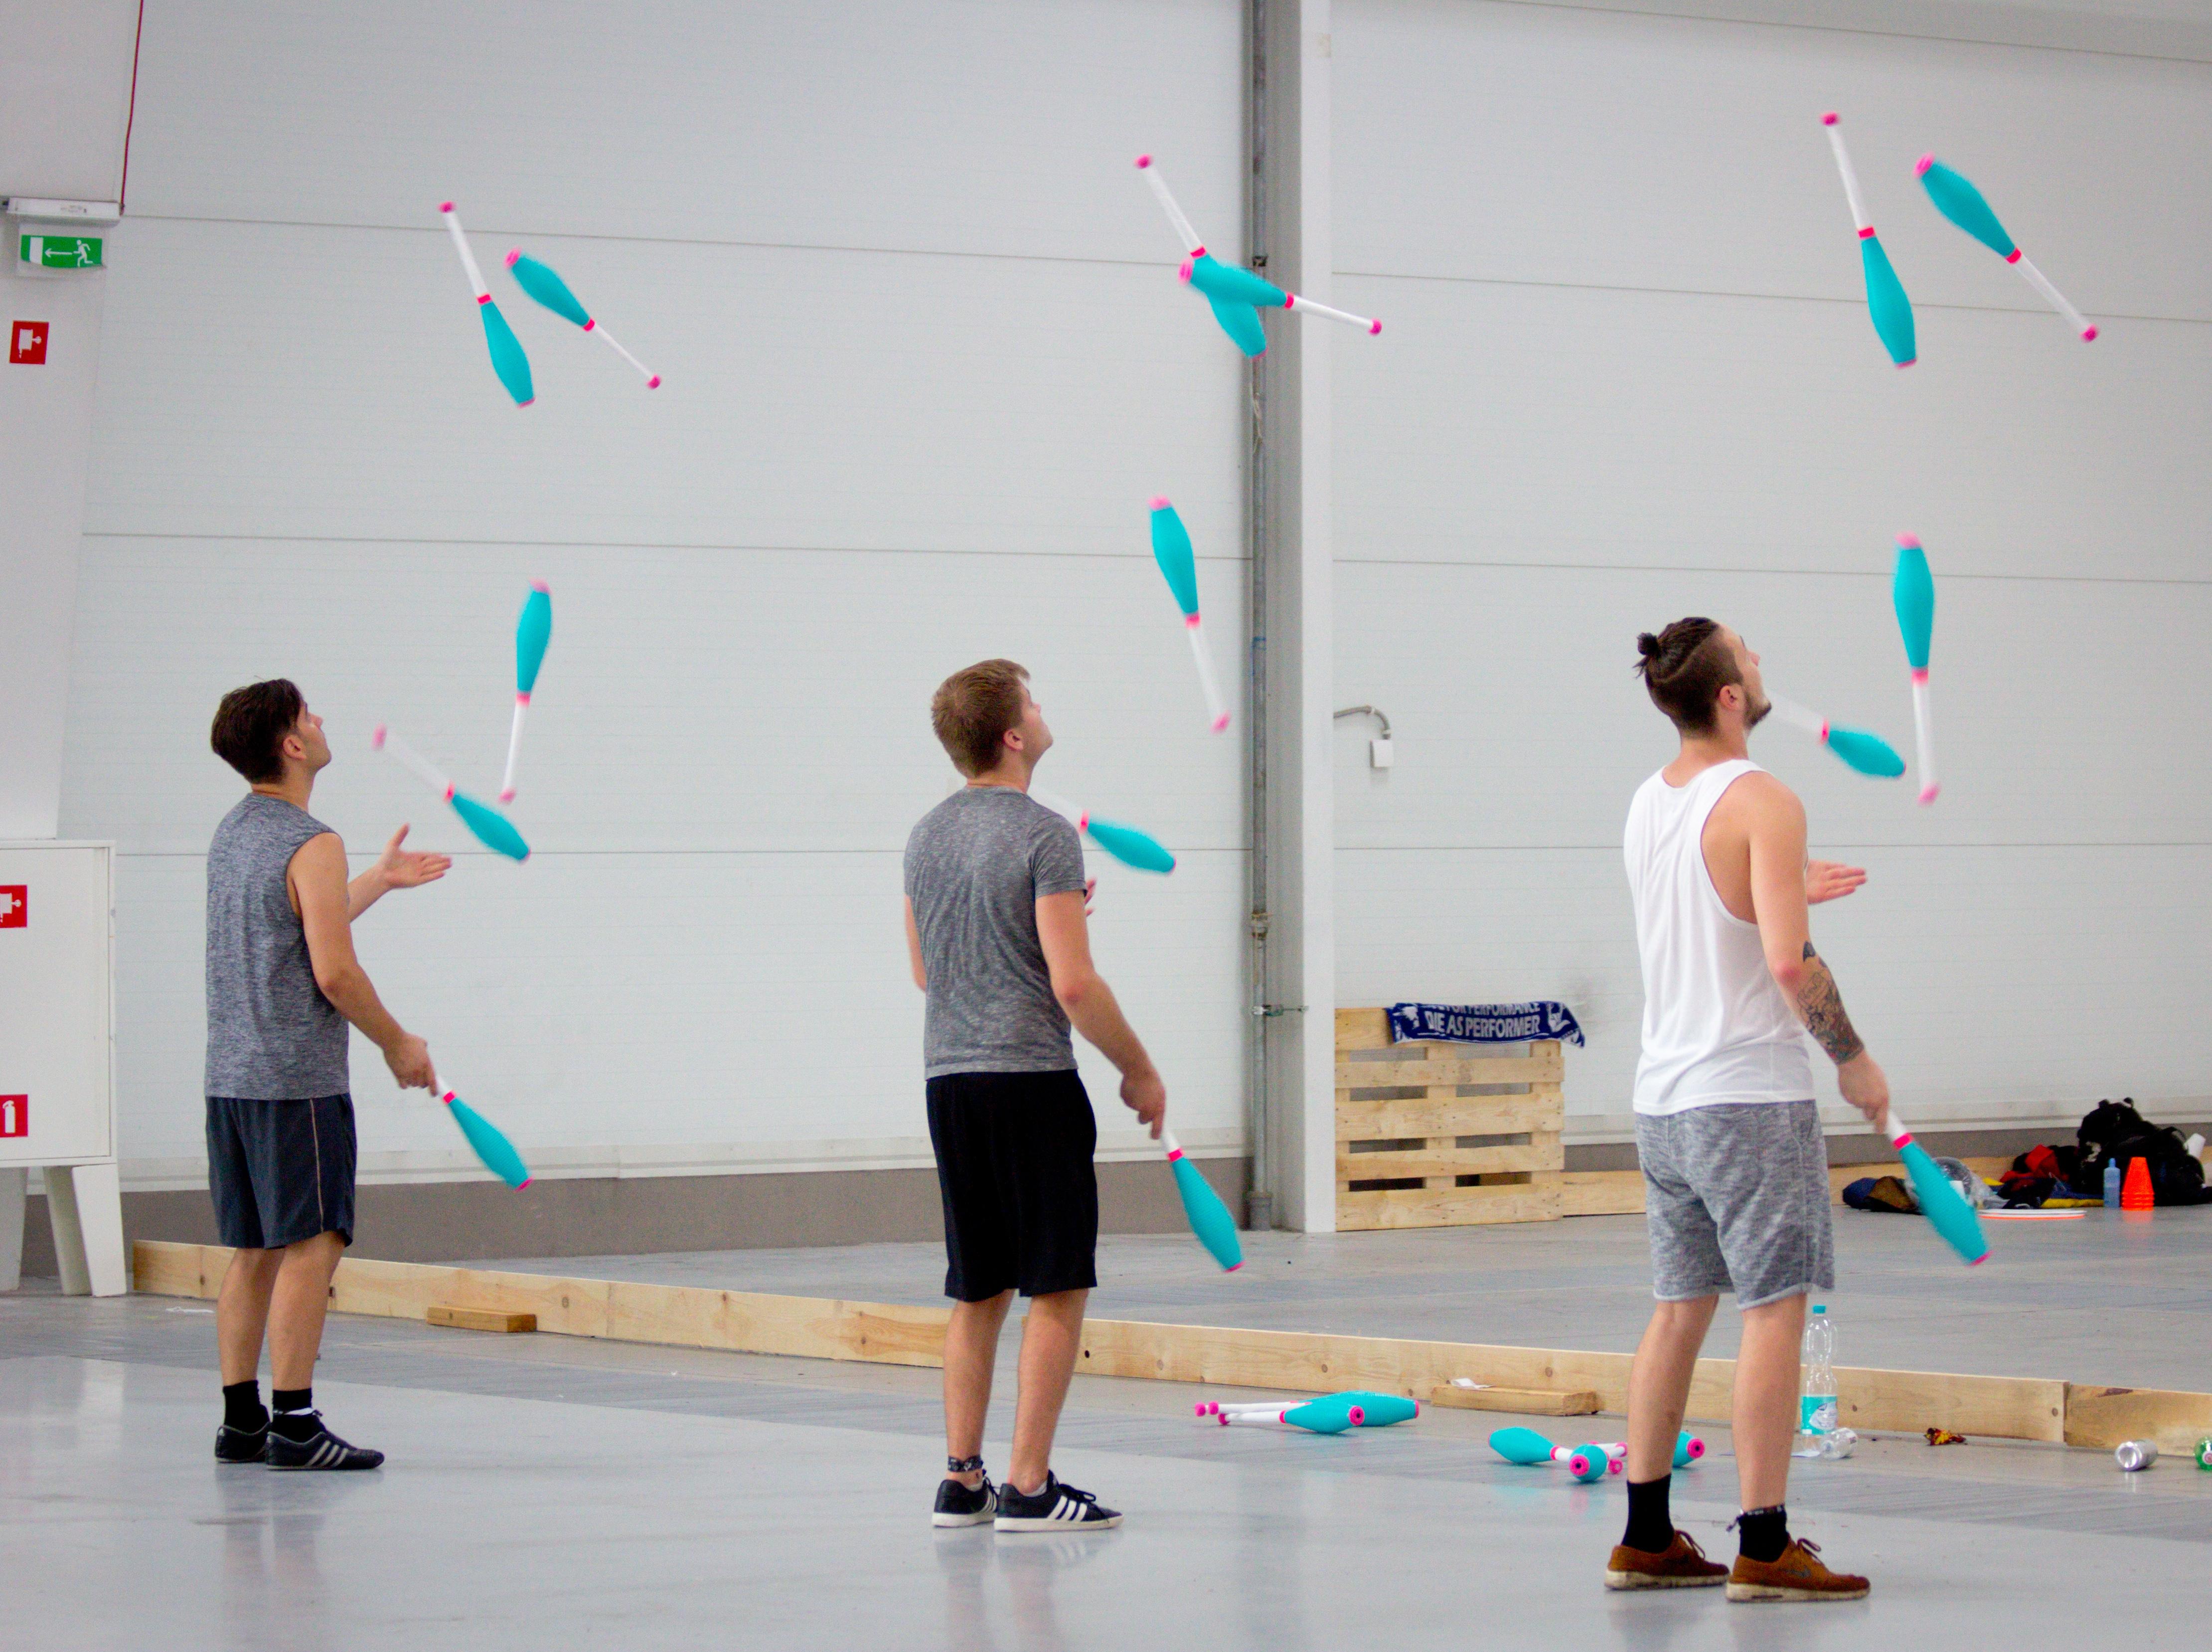 EJC 2017 Lublin Day 2: Main hall juggling.